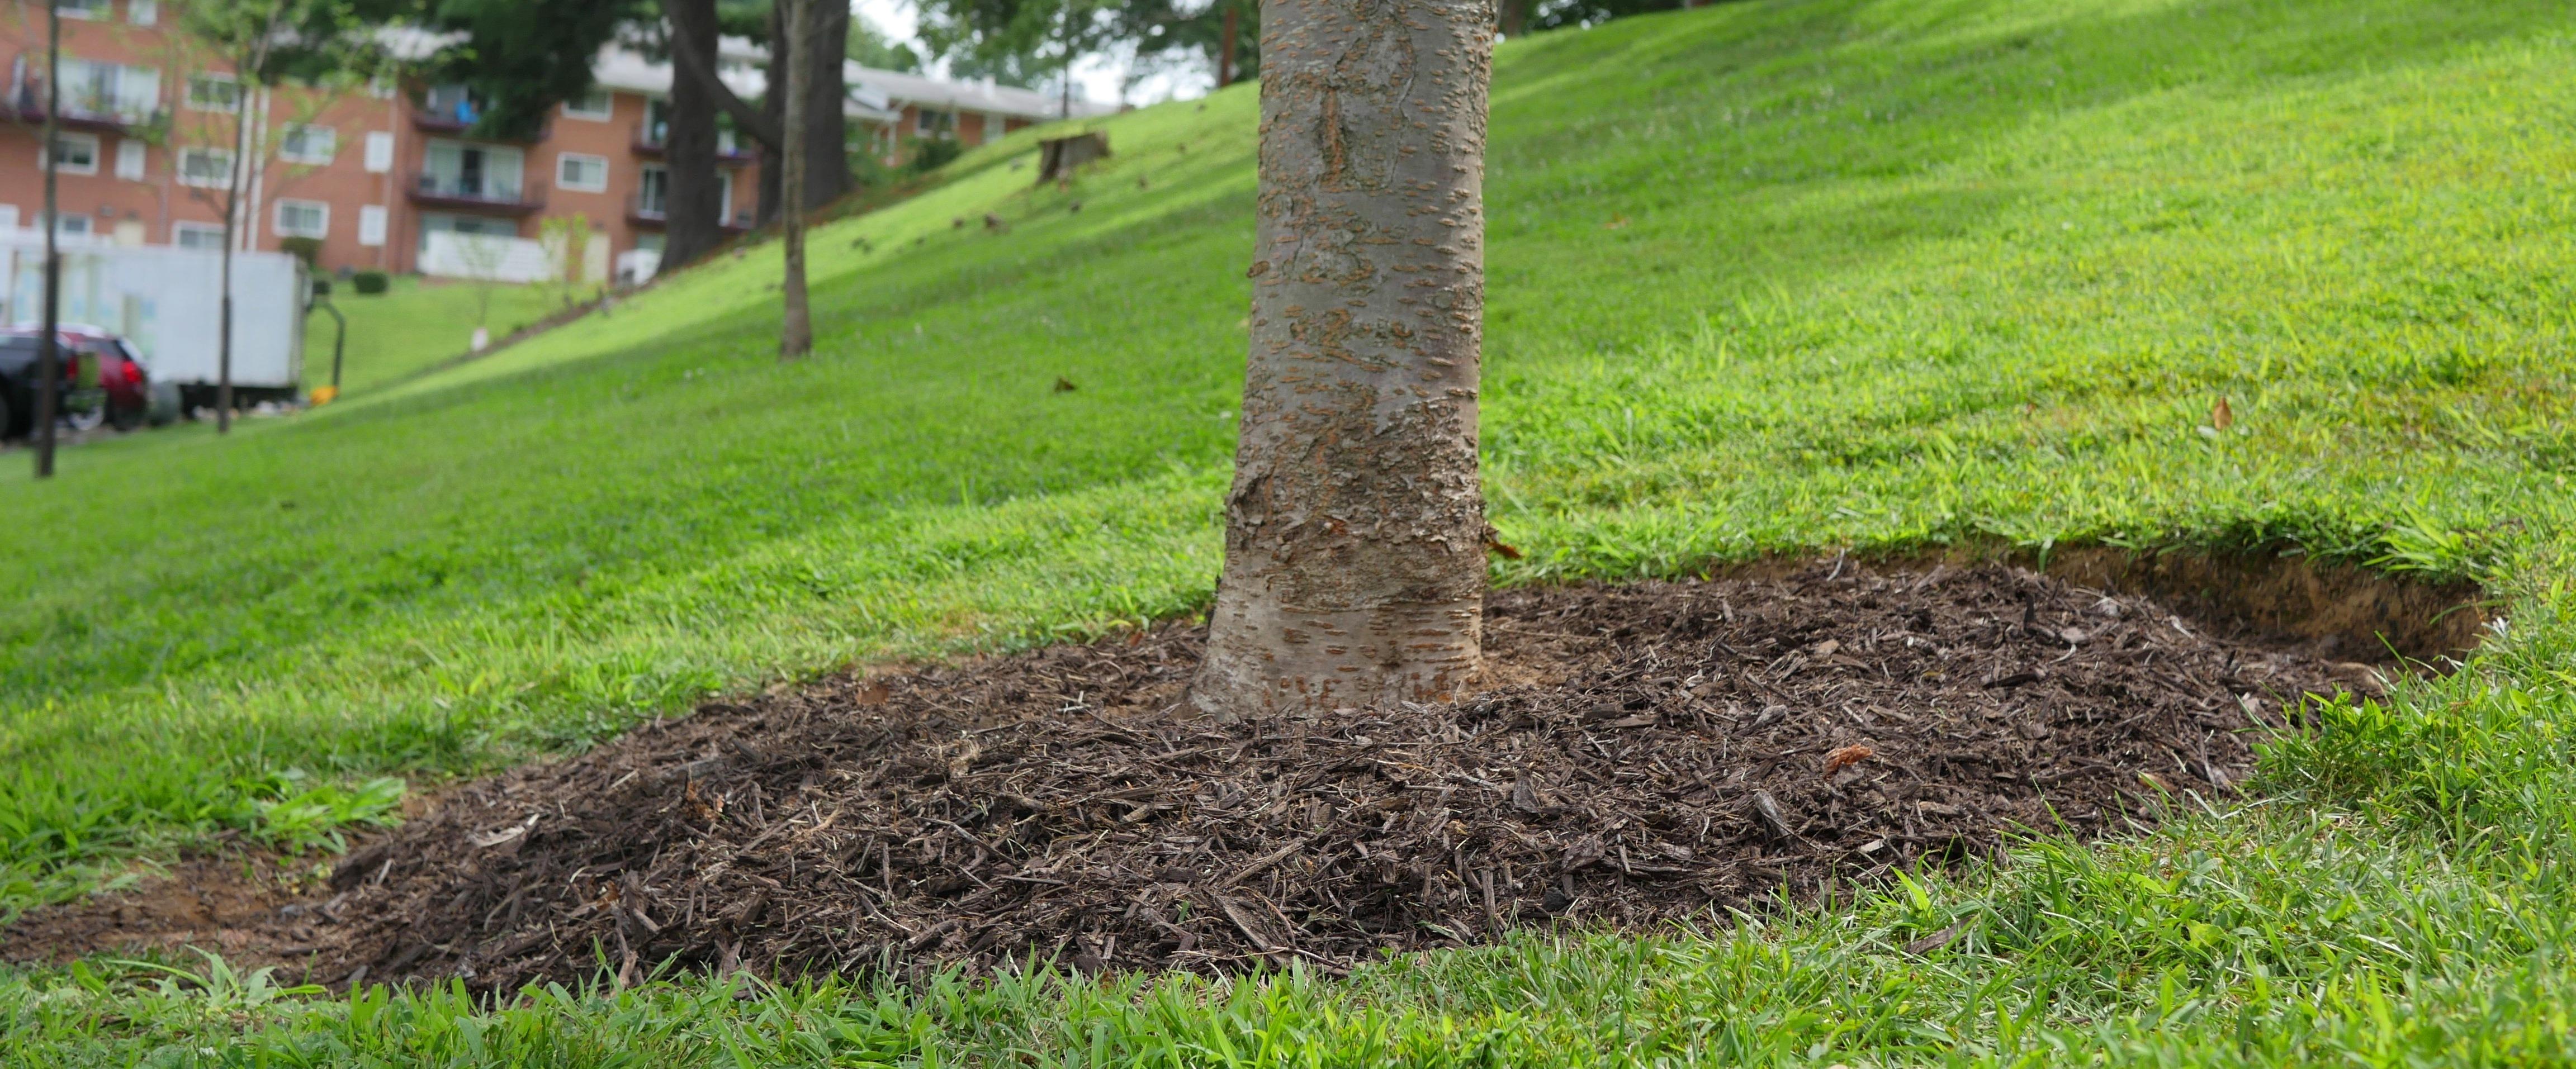 Proper mulch around a tree